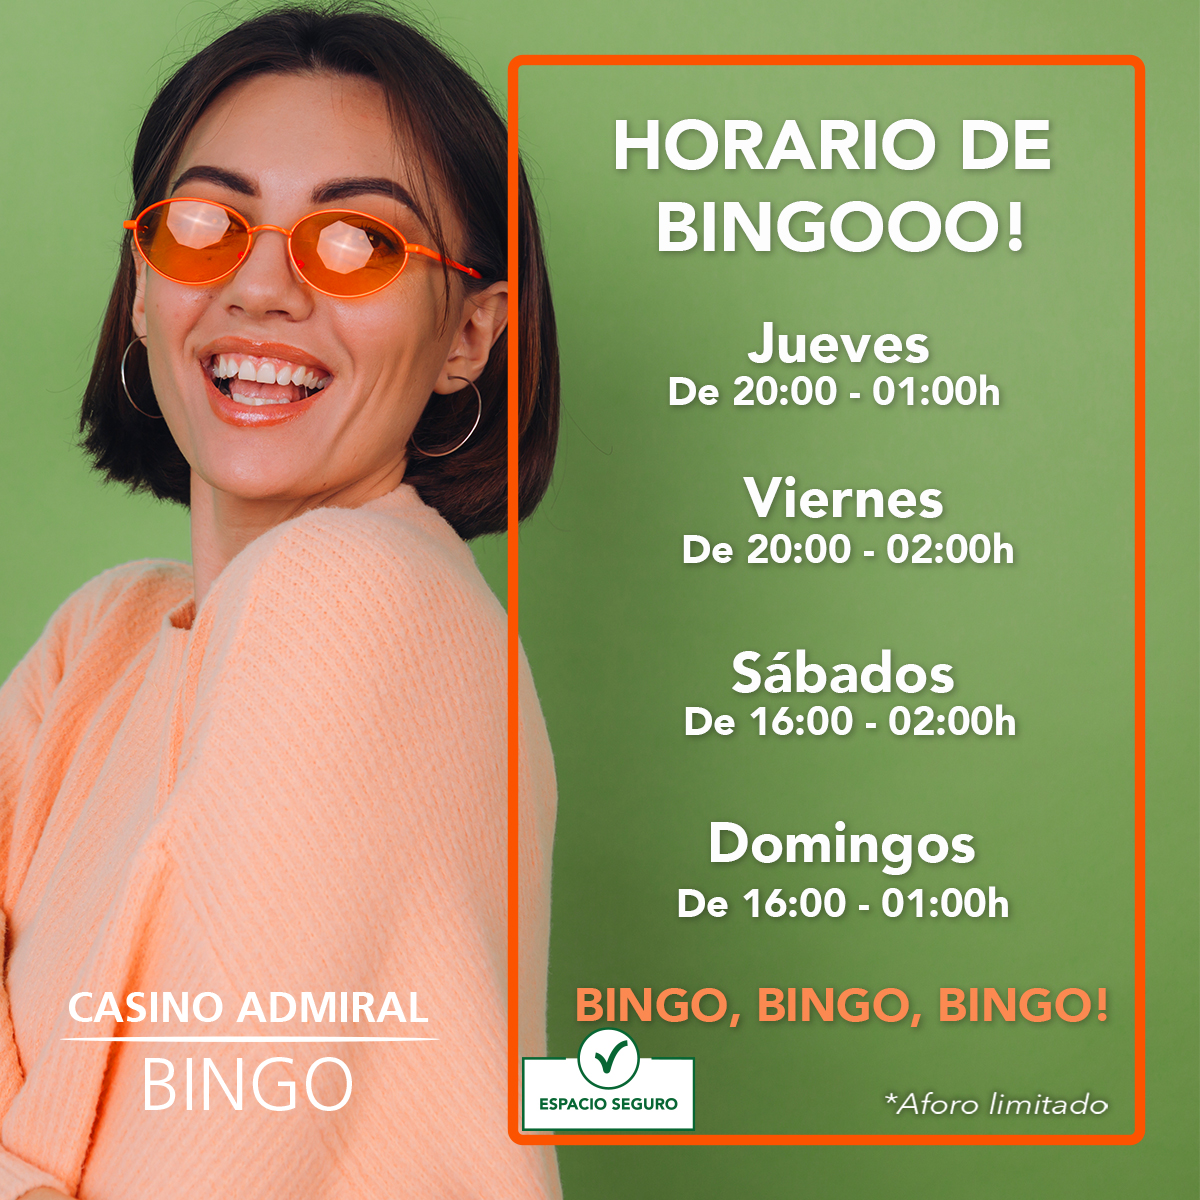 CASR_Bingo3